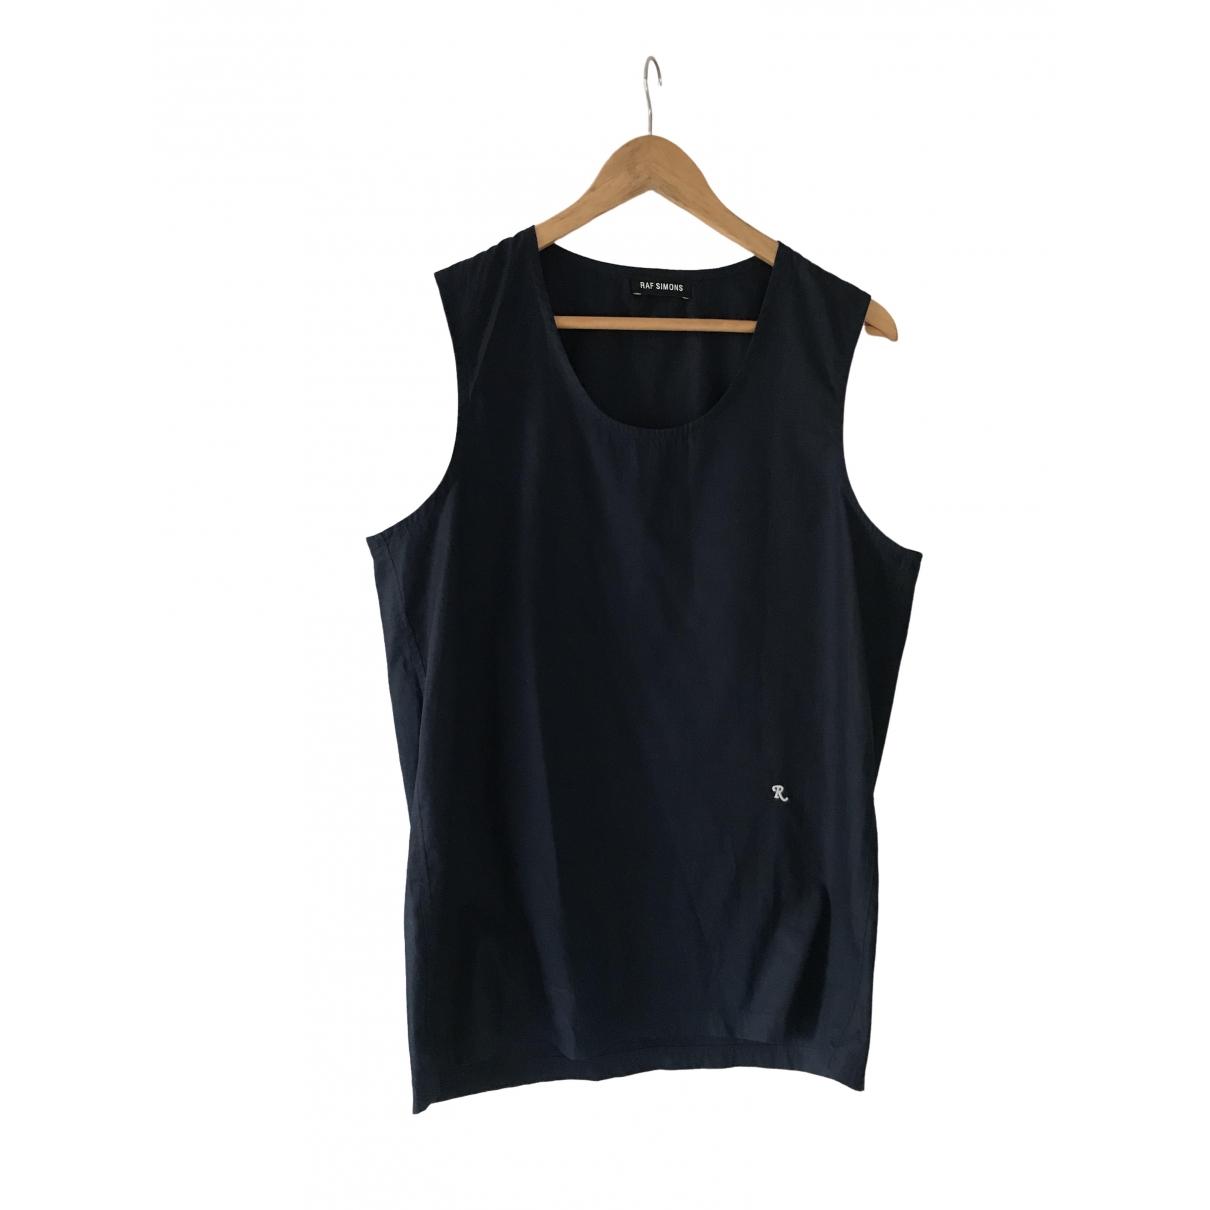 Raf Simons - Tee shirts   pour homme en coton - marine